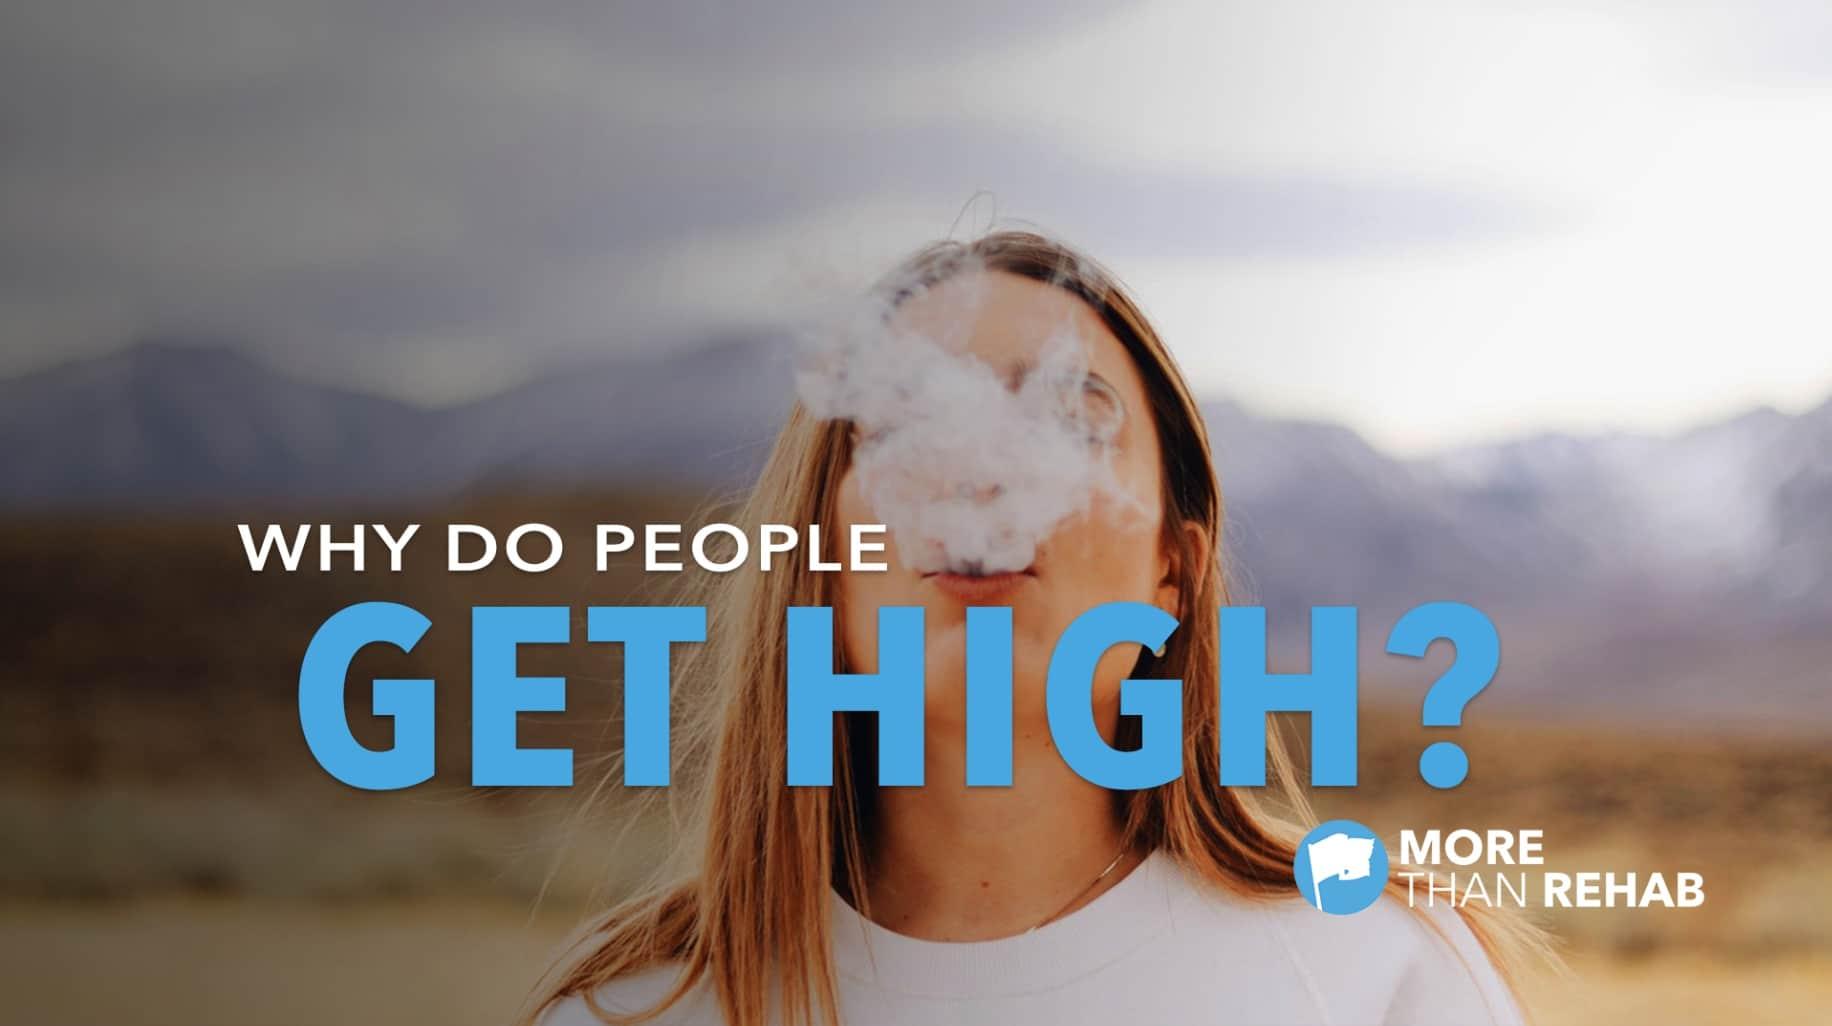 why-do-people-get-high-evidence-based-drug-alcohol-rehabilitation-Houston-Texas